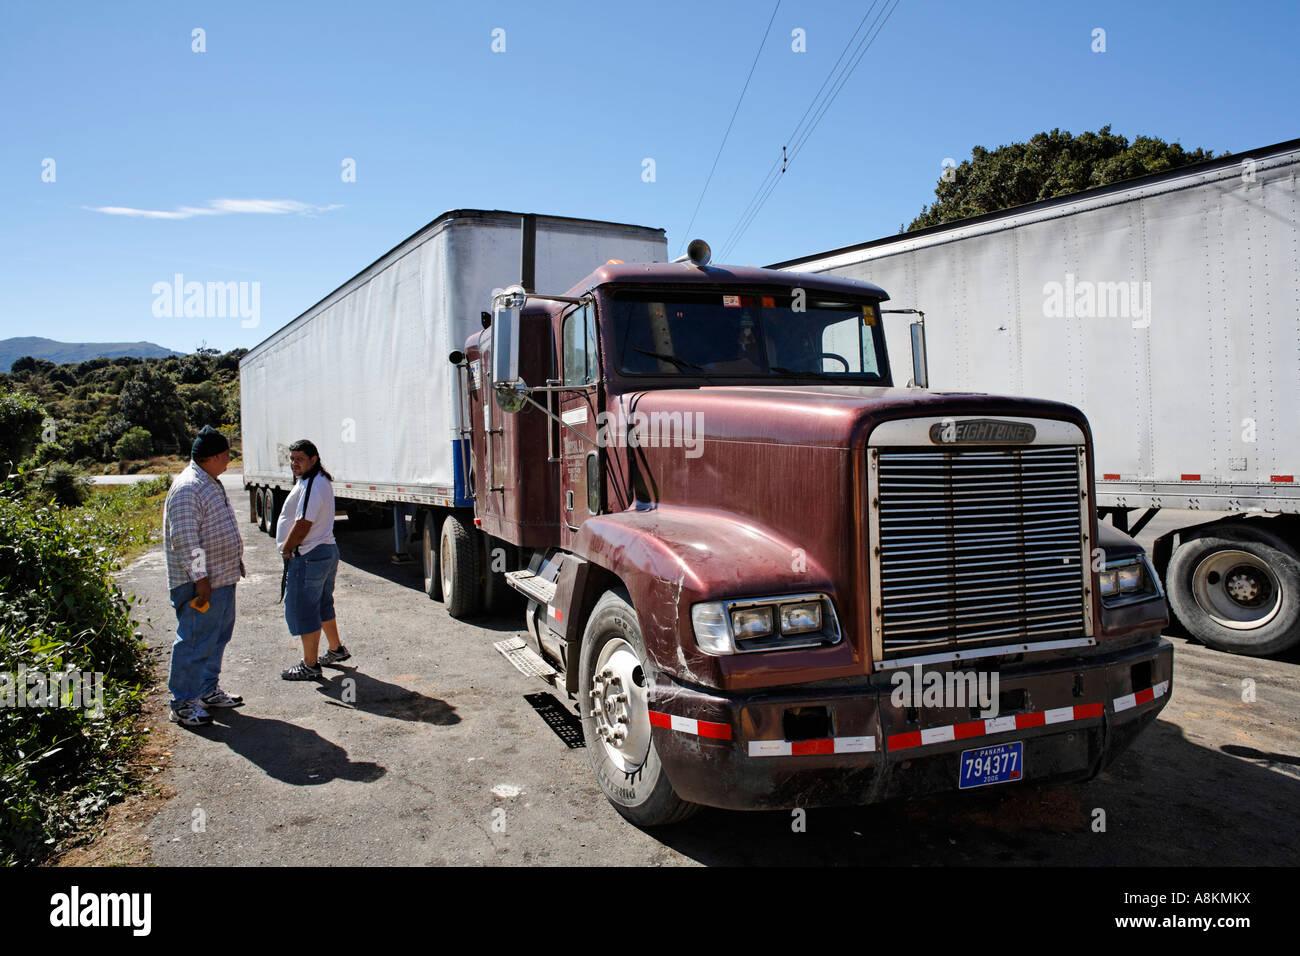 Truck at Interamericana, Panamericana in Ojo de Agua, Costa Rica - Stock Image